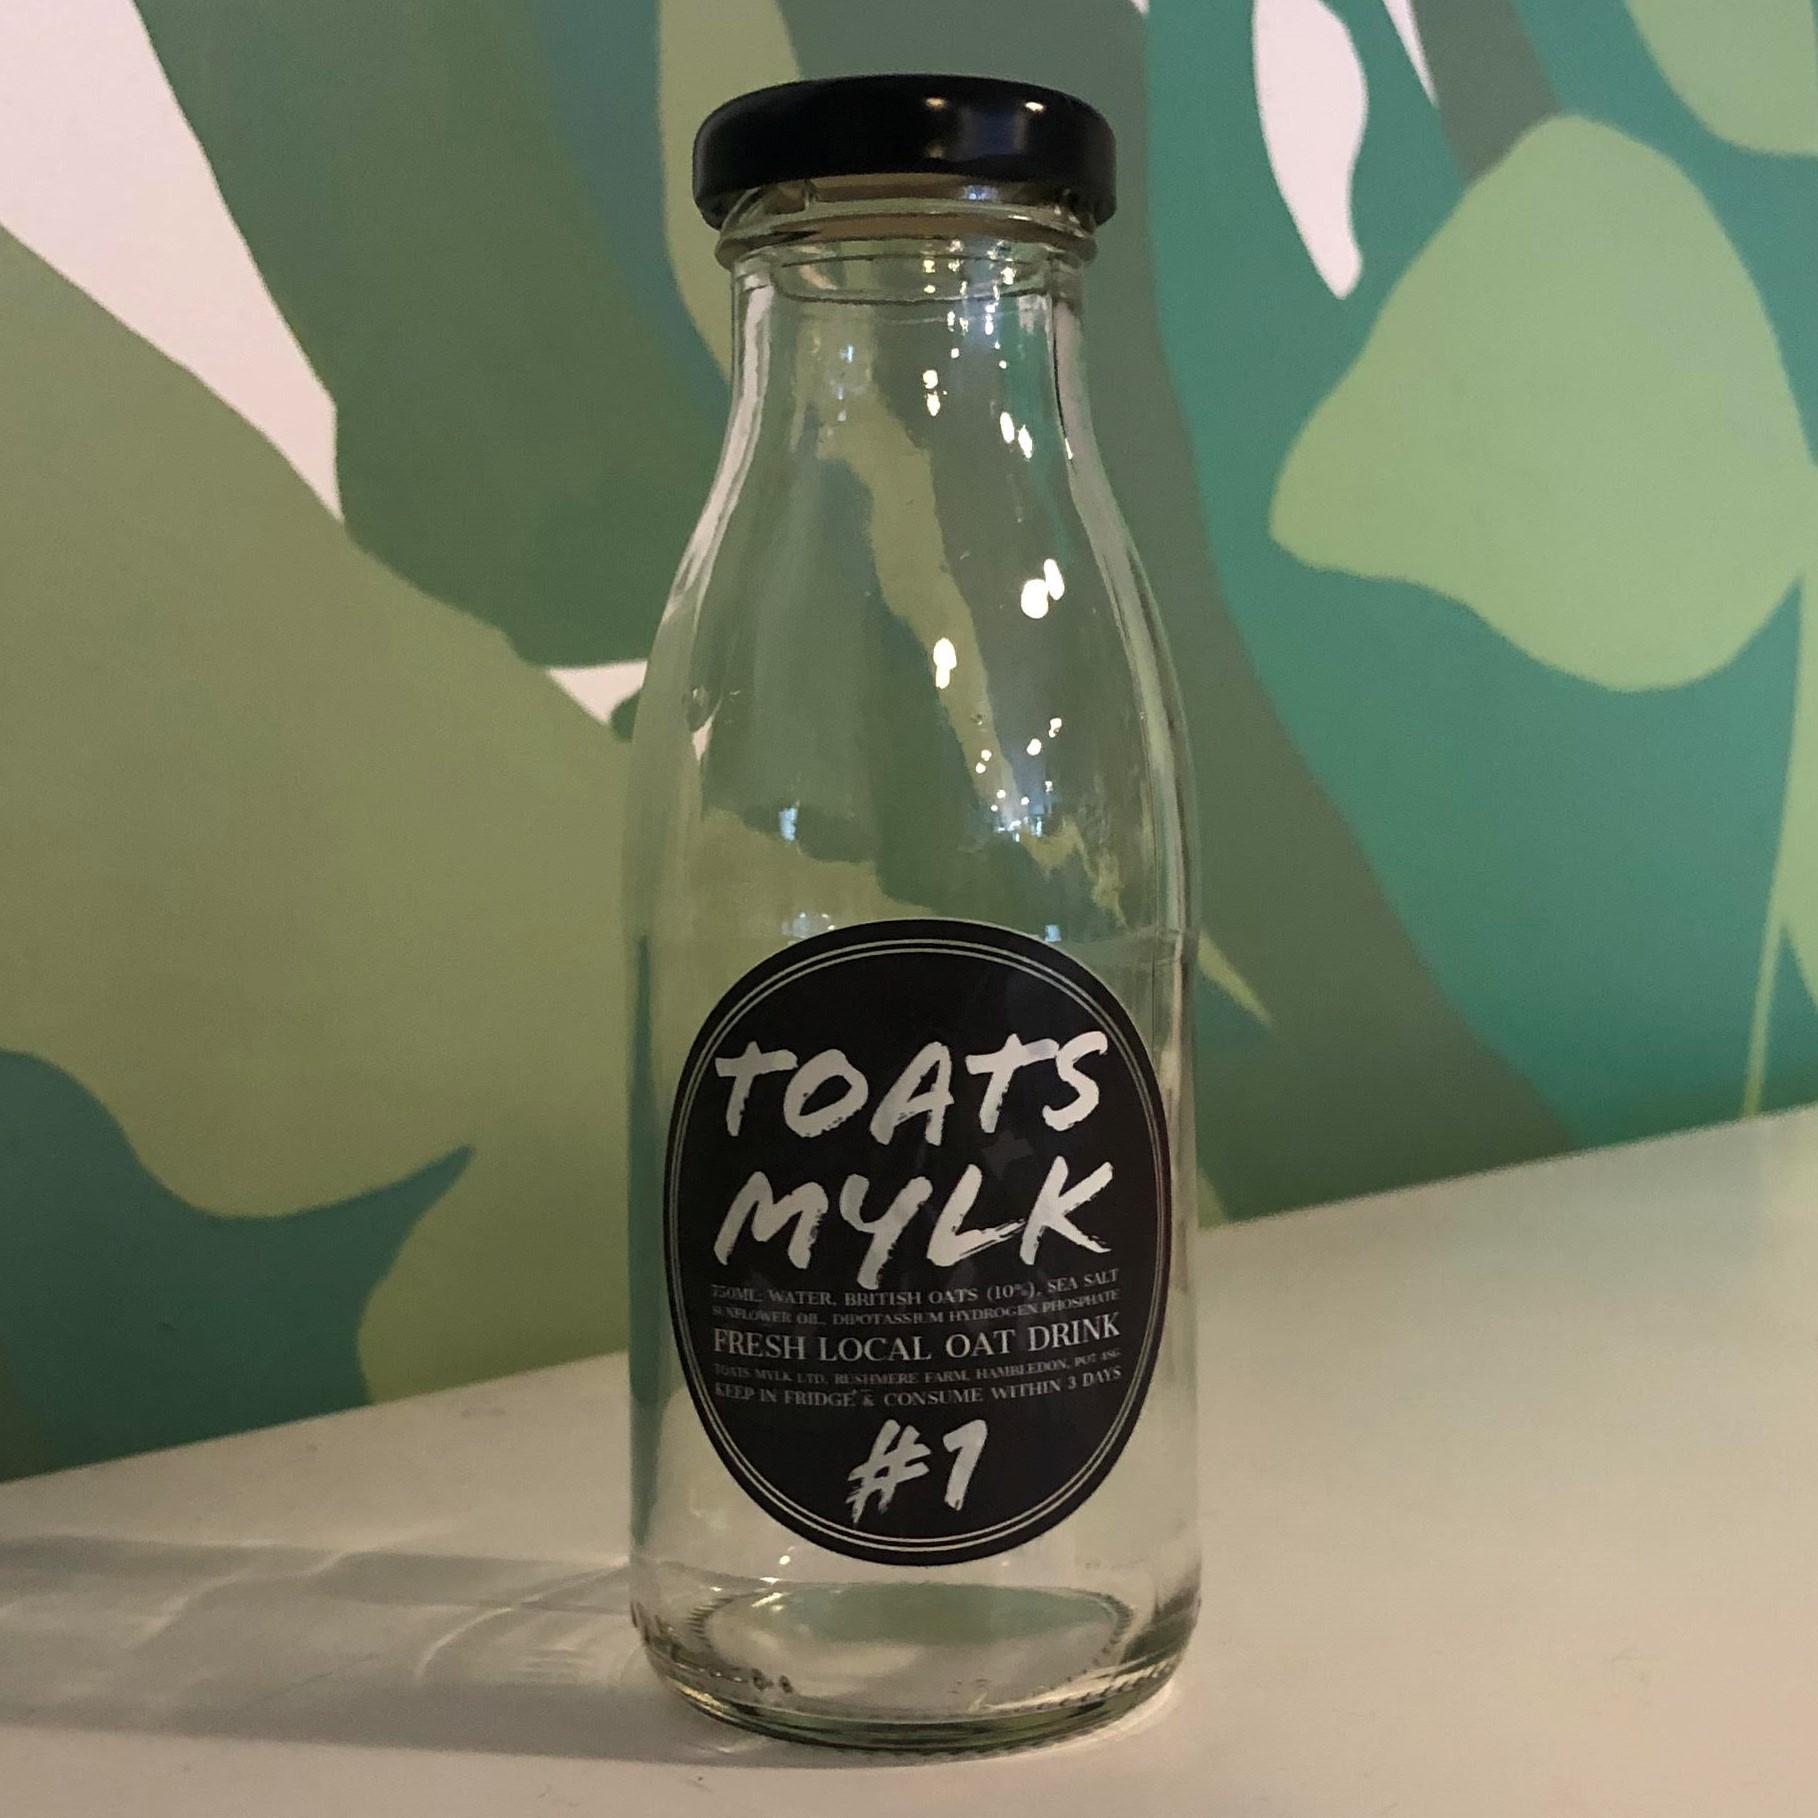 250ml Glass Bottle (TOATS MYLK)